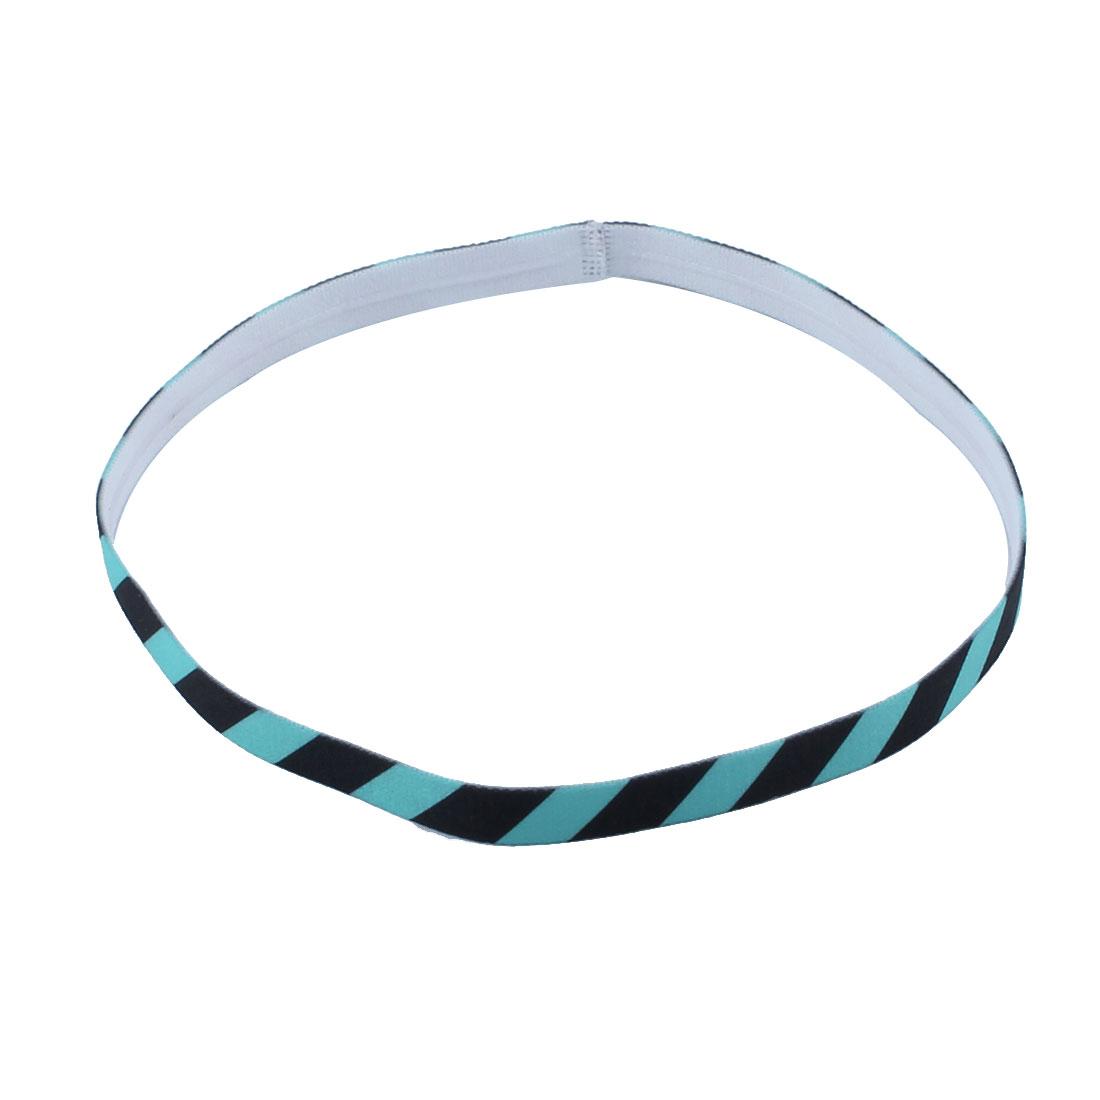 Exercise Silicone Flower Printed Non-slip Strech Sports Headband Light Blue Black